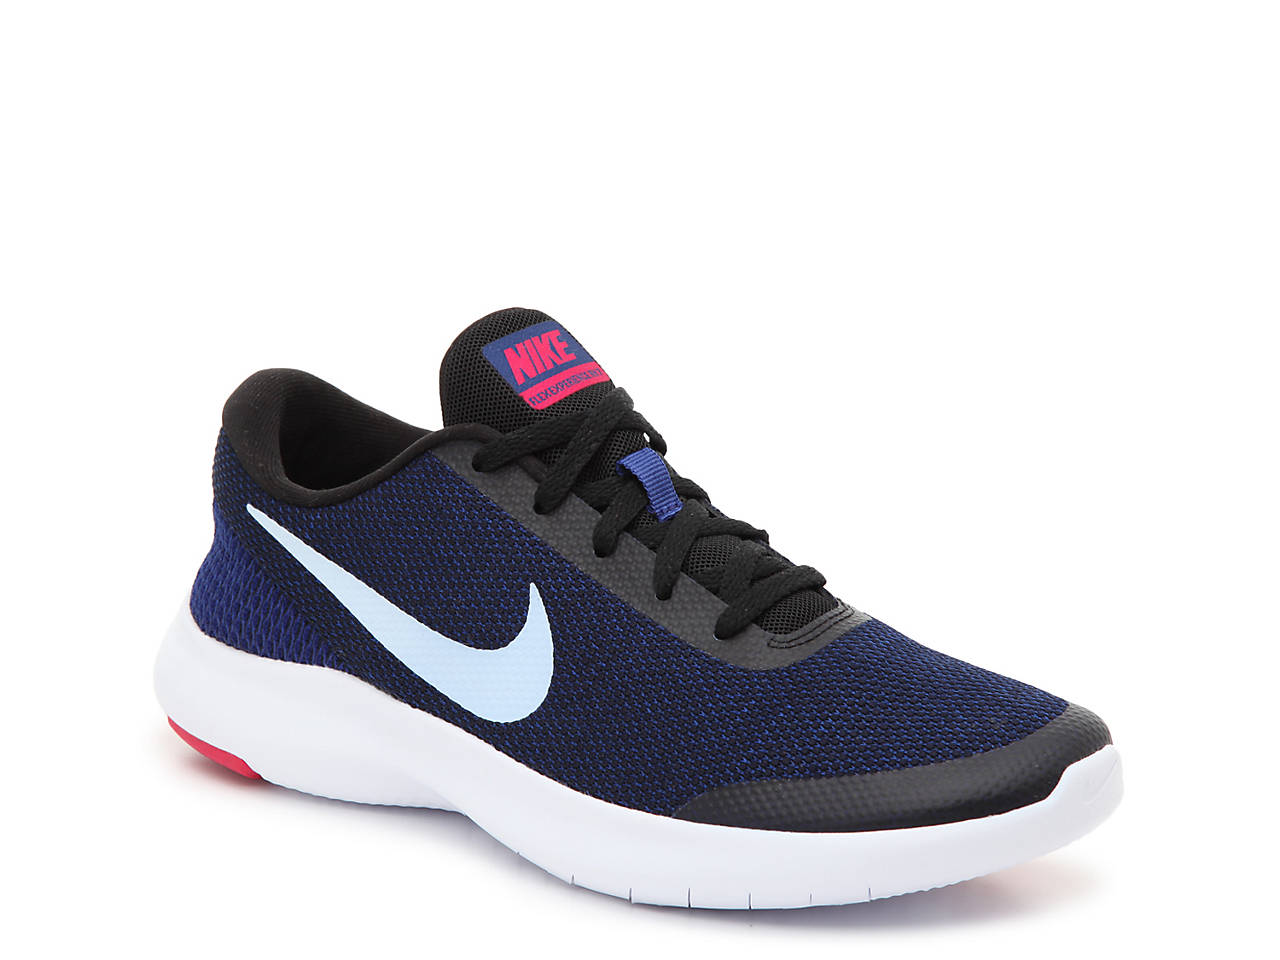 Nike Flex Experience RN 7 Lightweight Running Shoe - Women s Women s ... 355496419f